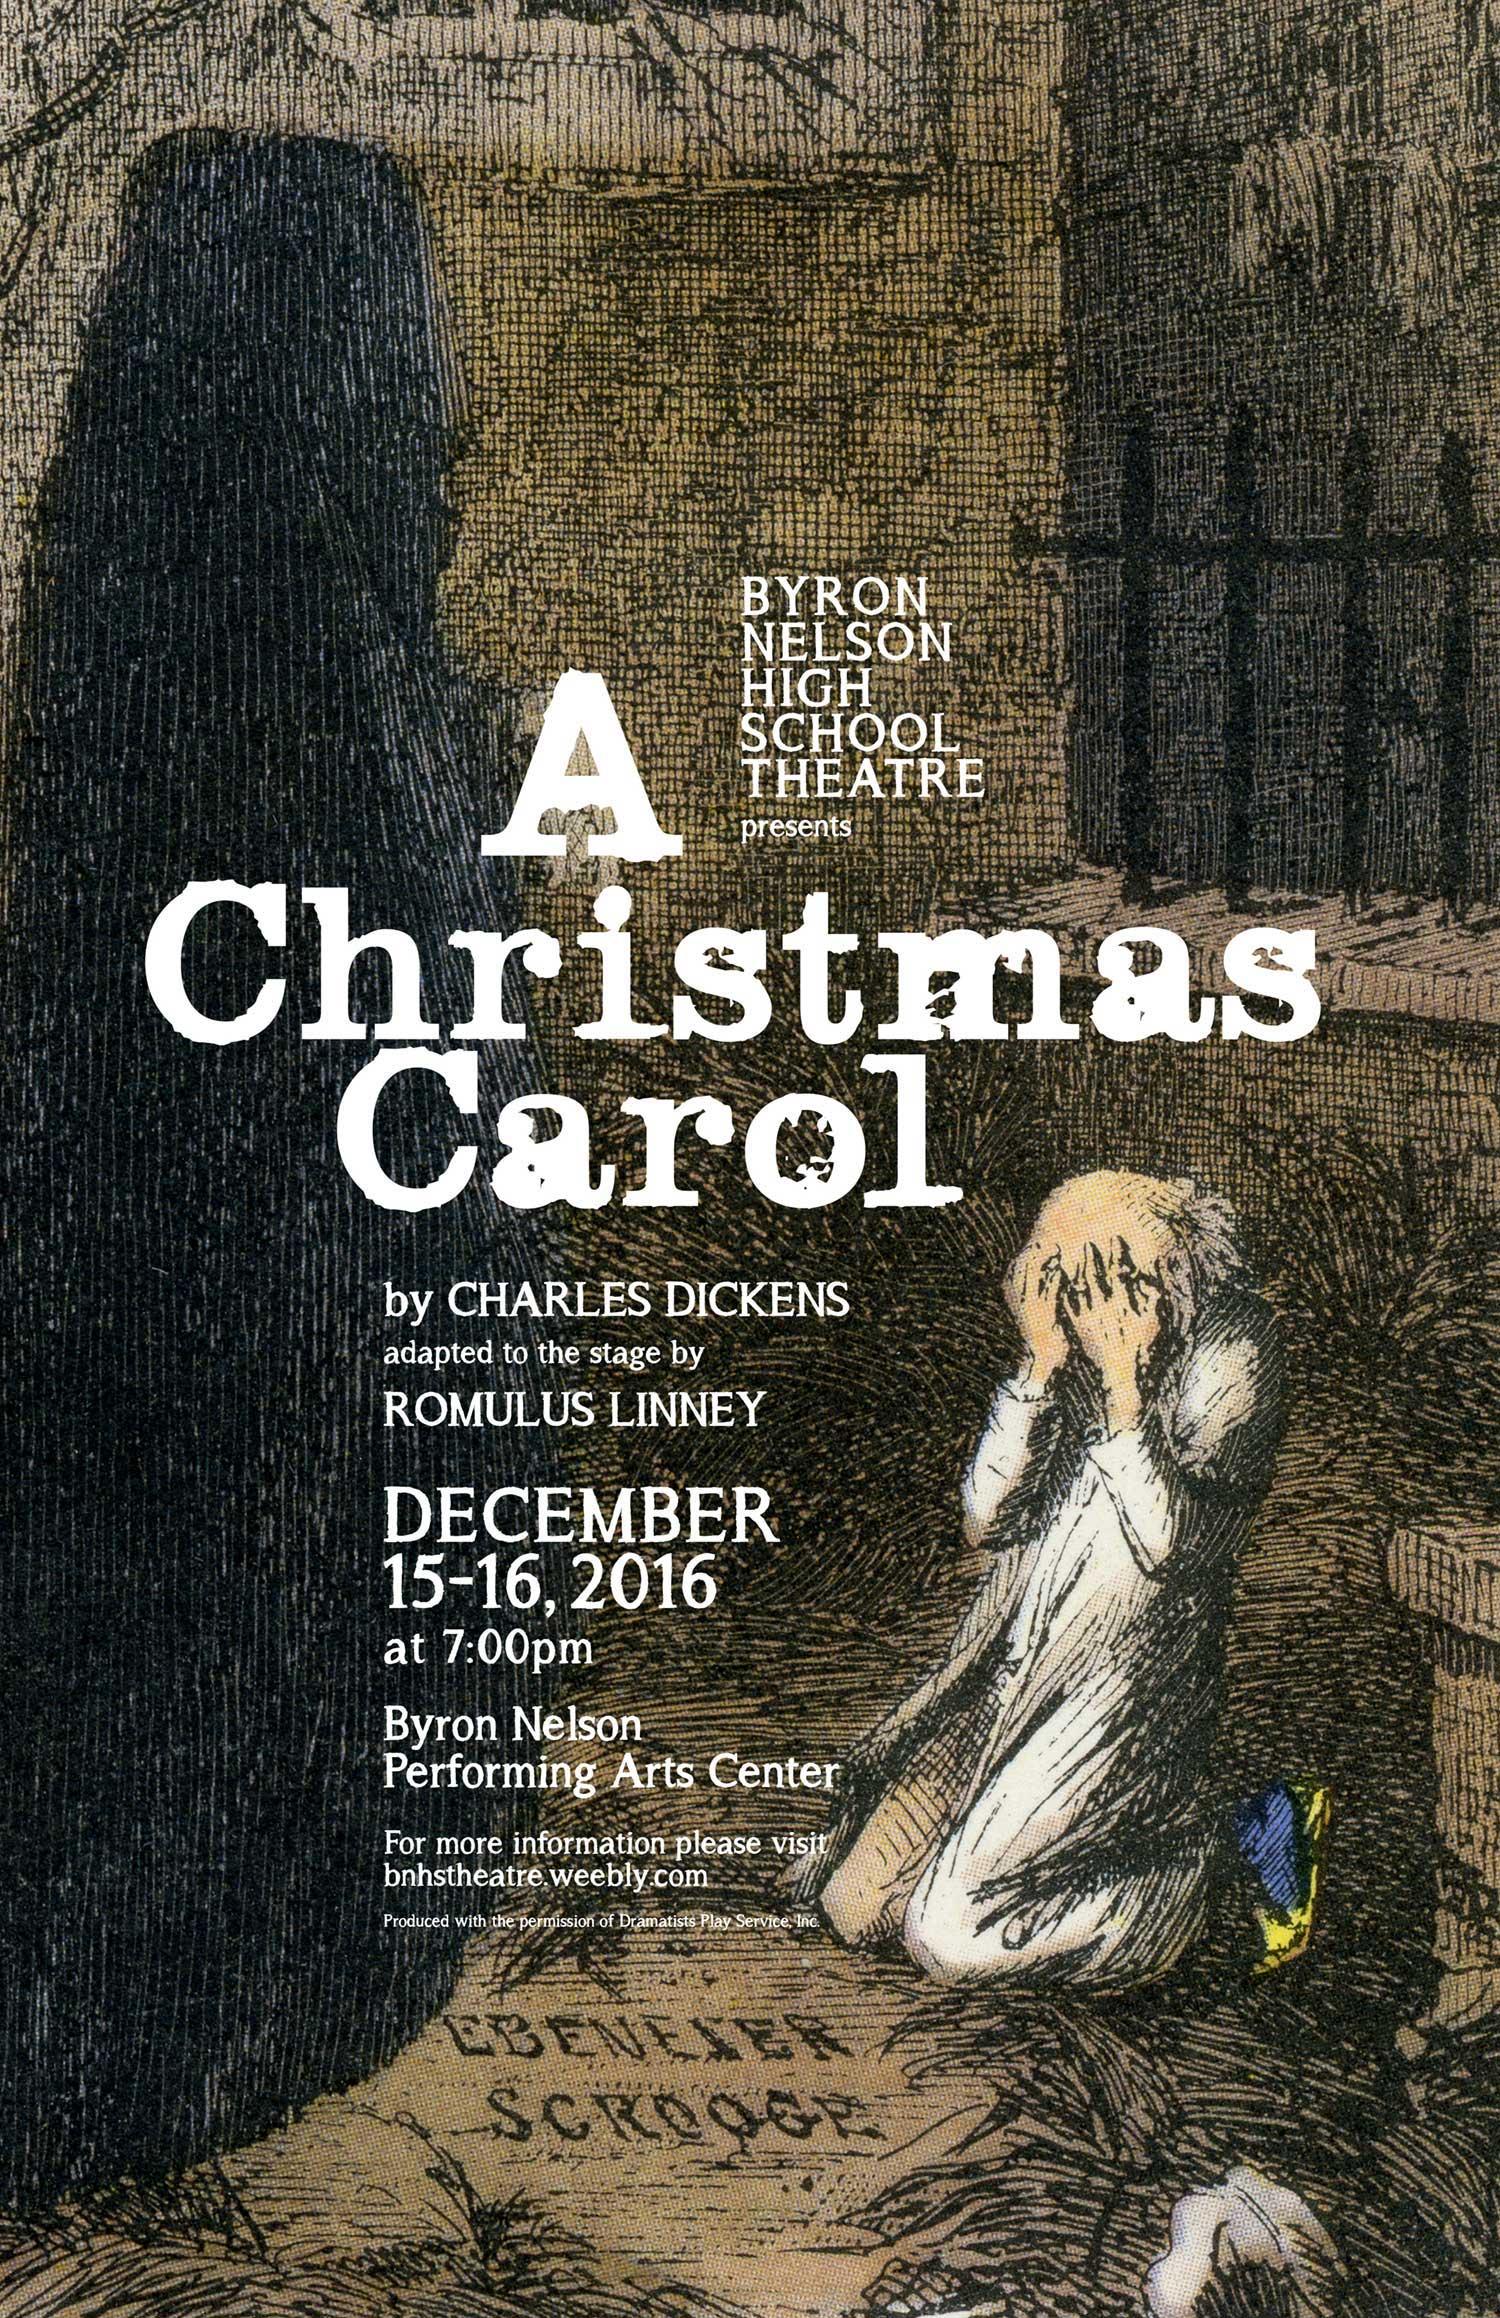 Christmas-Carol-Drama-Queen-Graphics-Illustration_ss.jpg